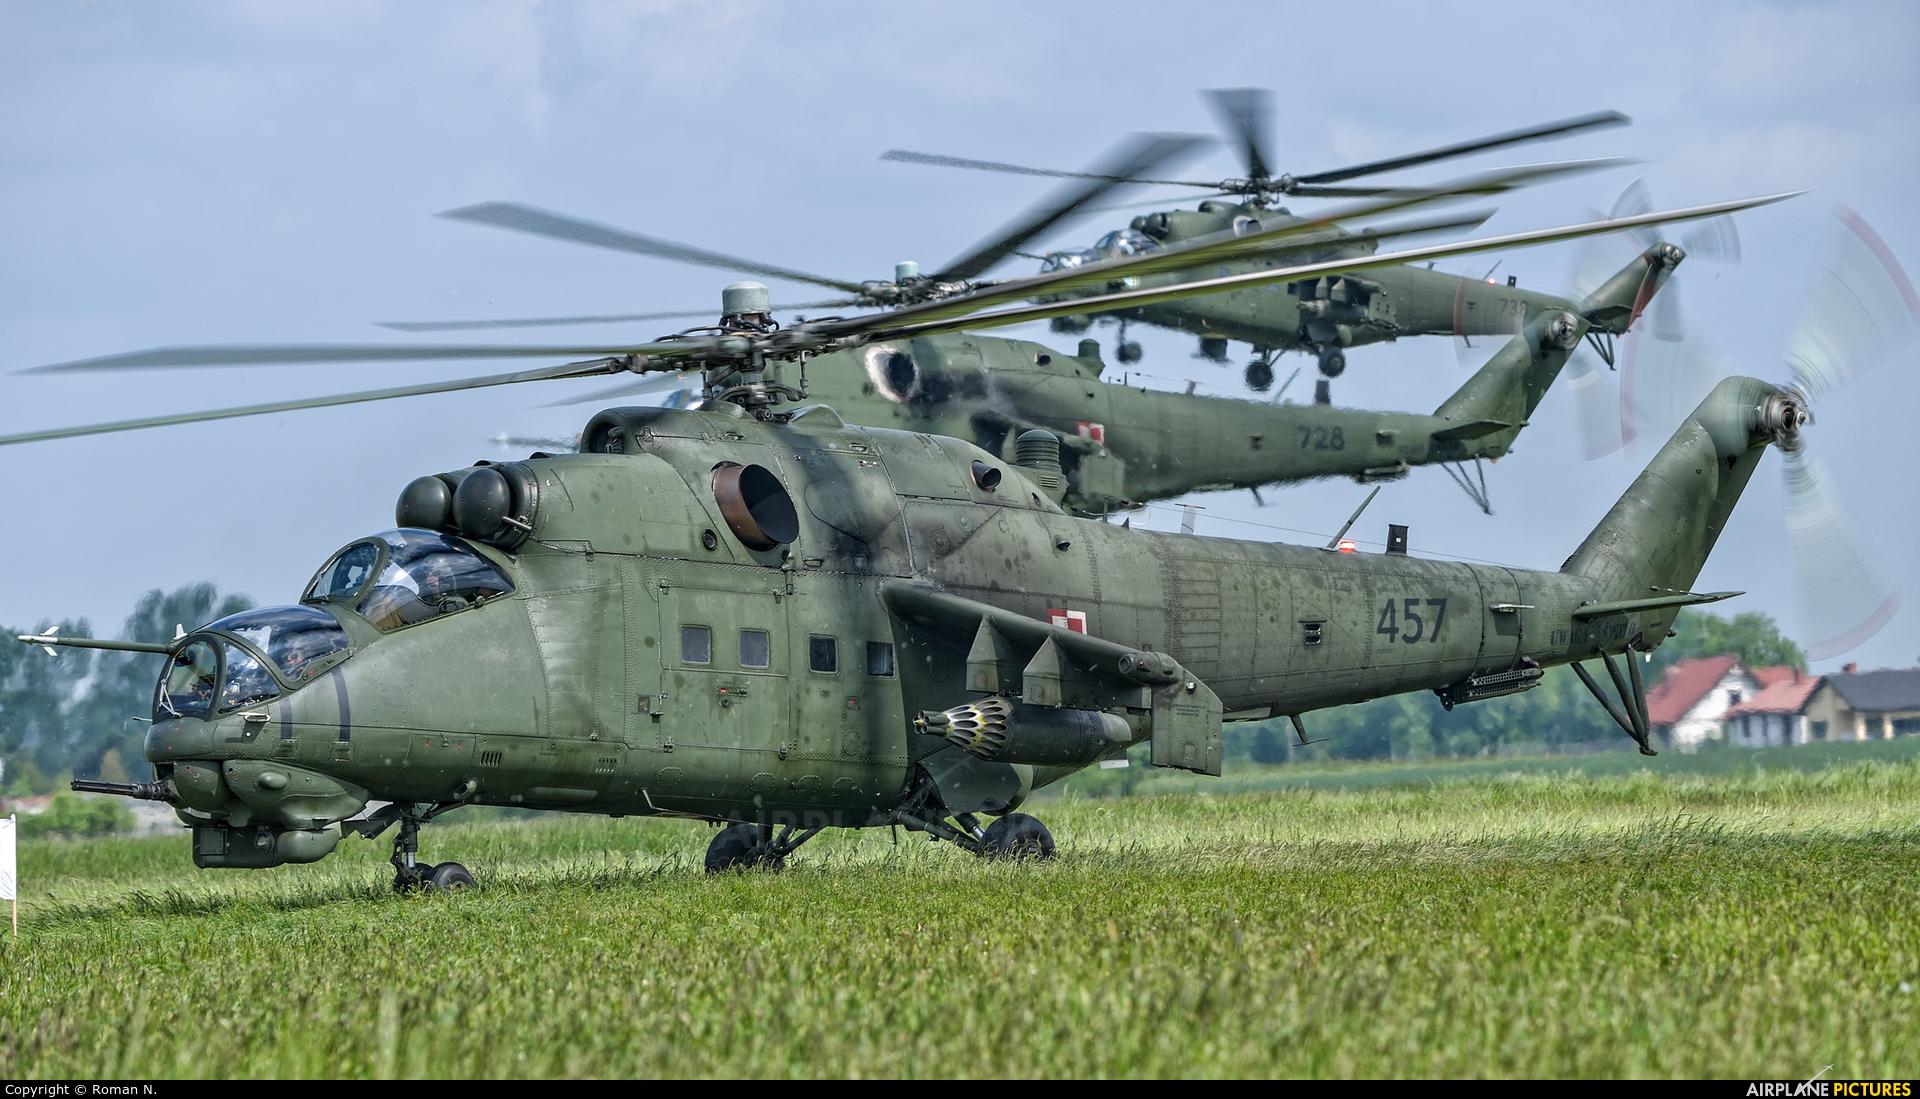 Poland - Army 457 aircraft at Inowrocław